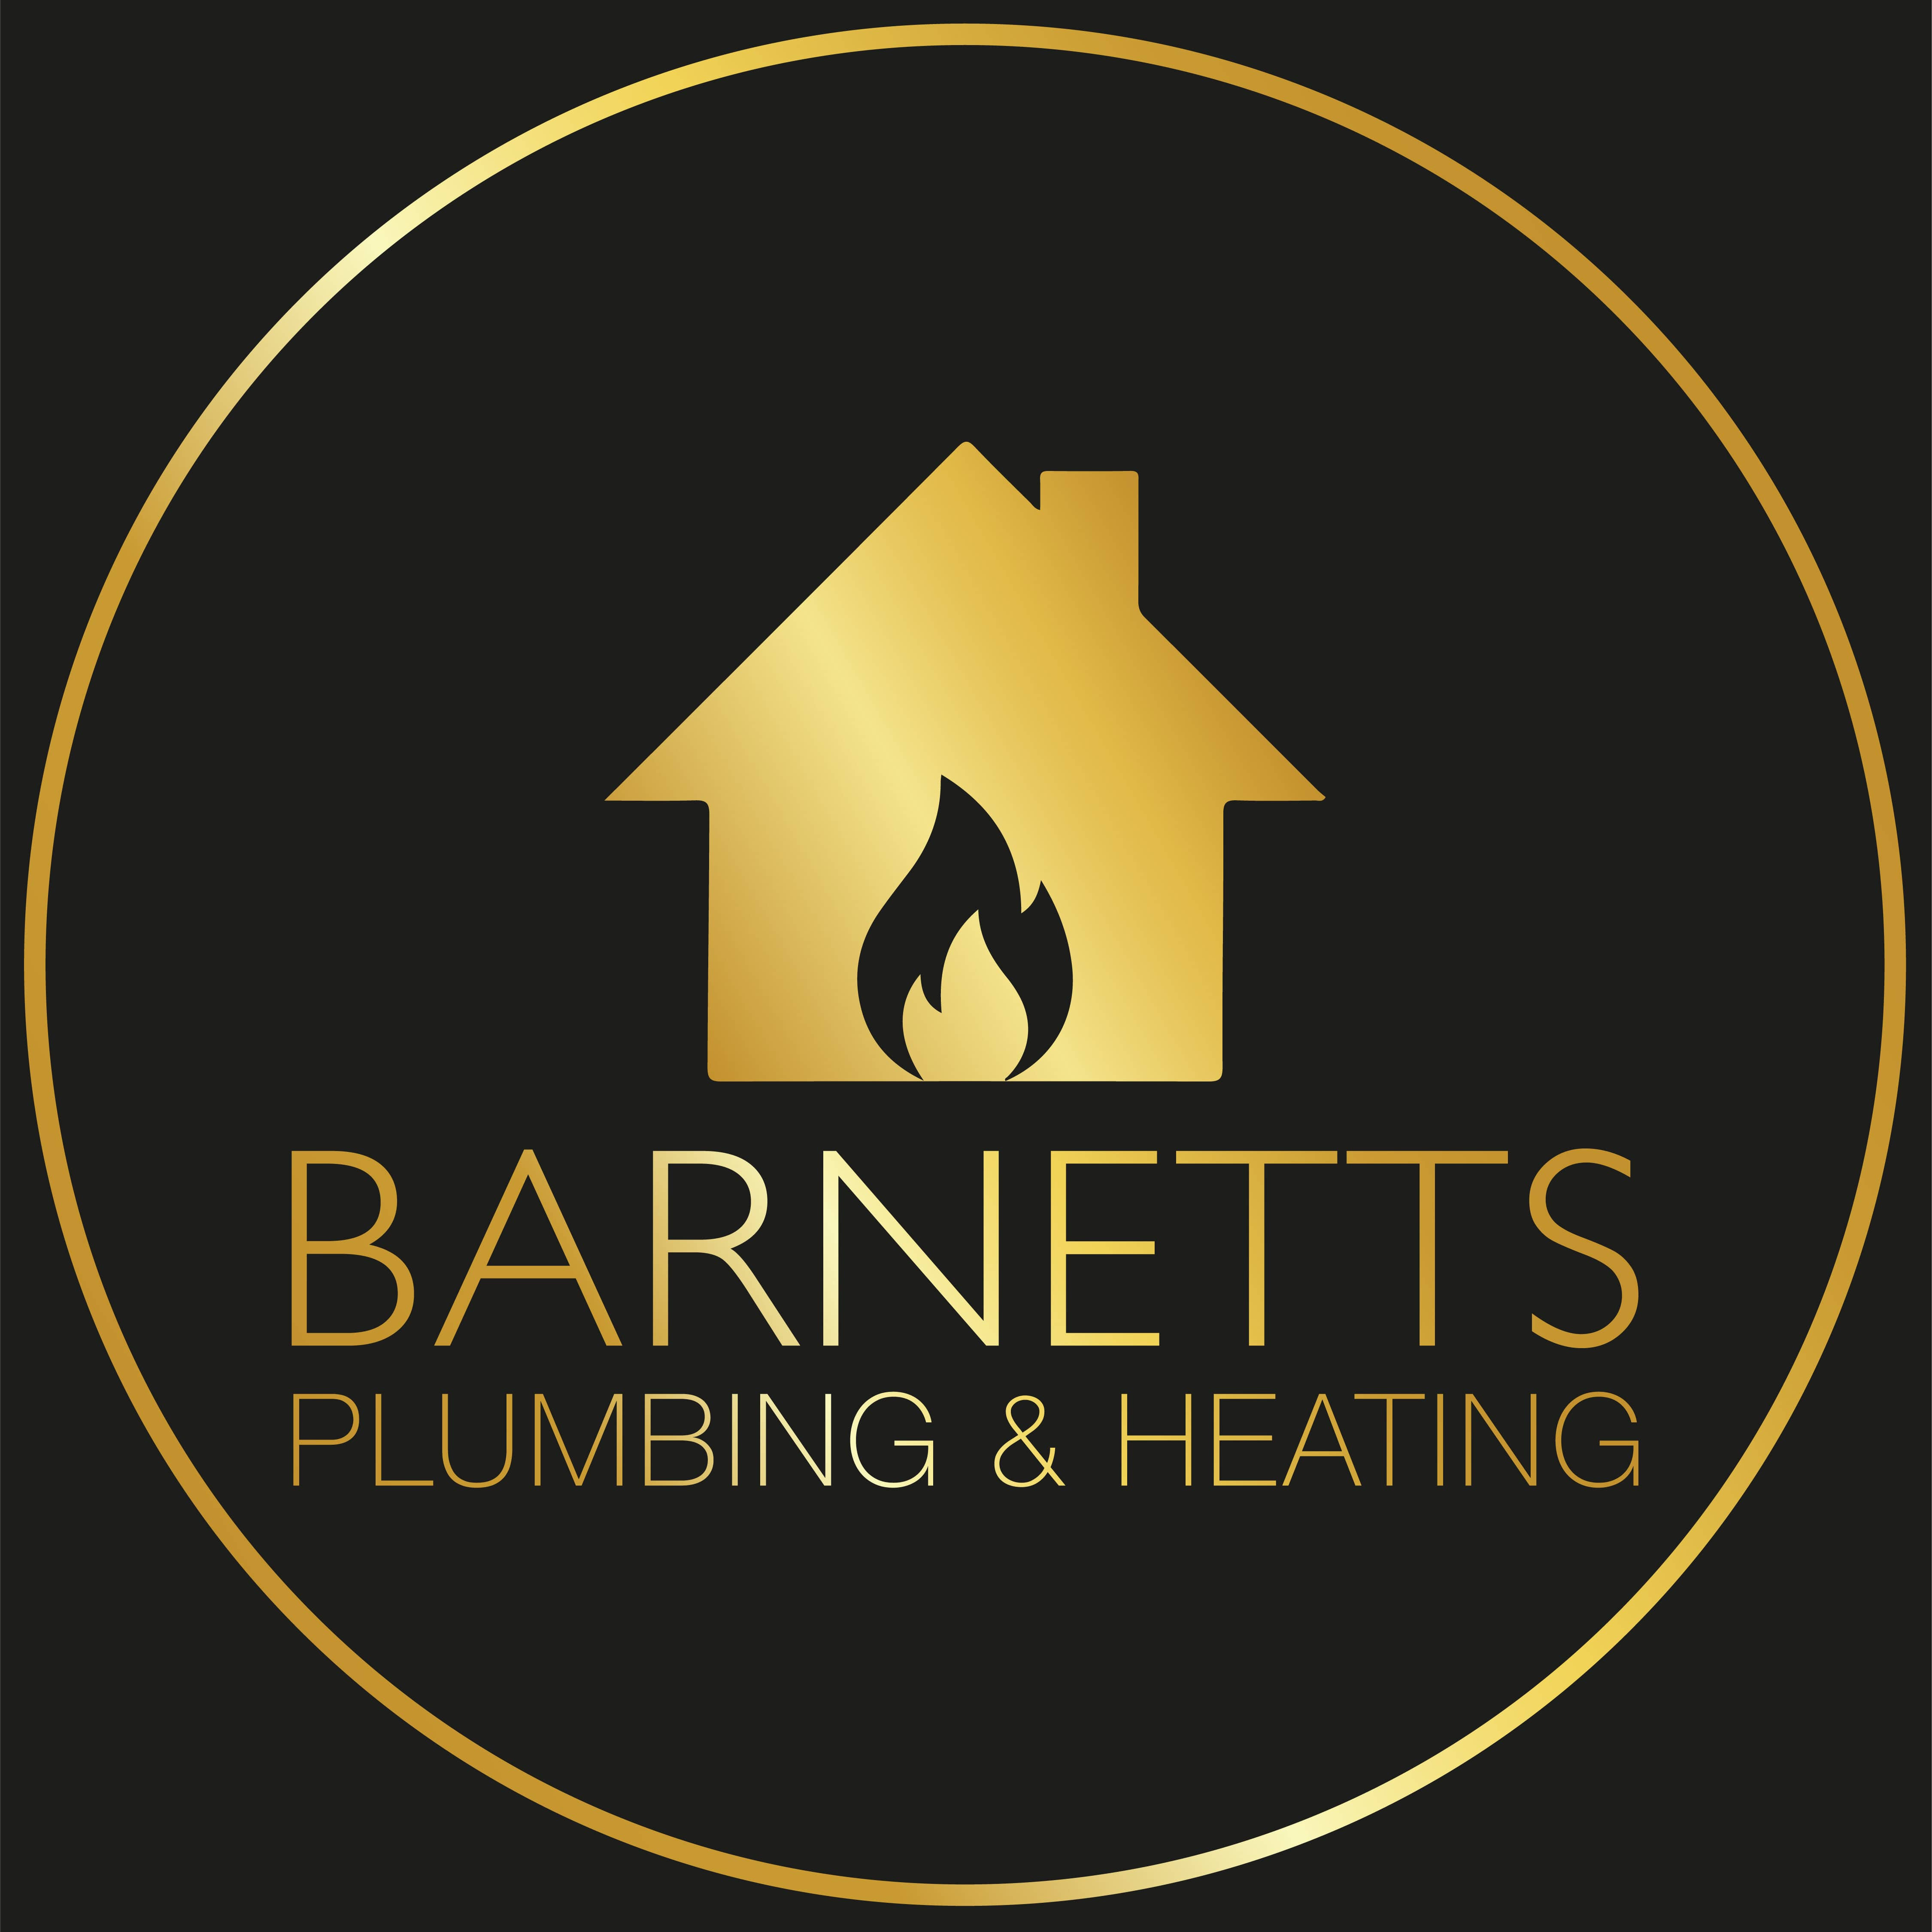 Barnetts Plumbing and Heating Verified Logo